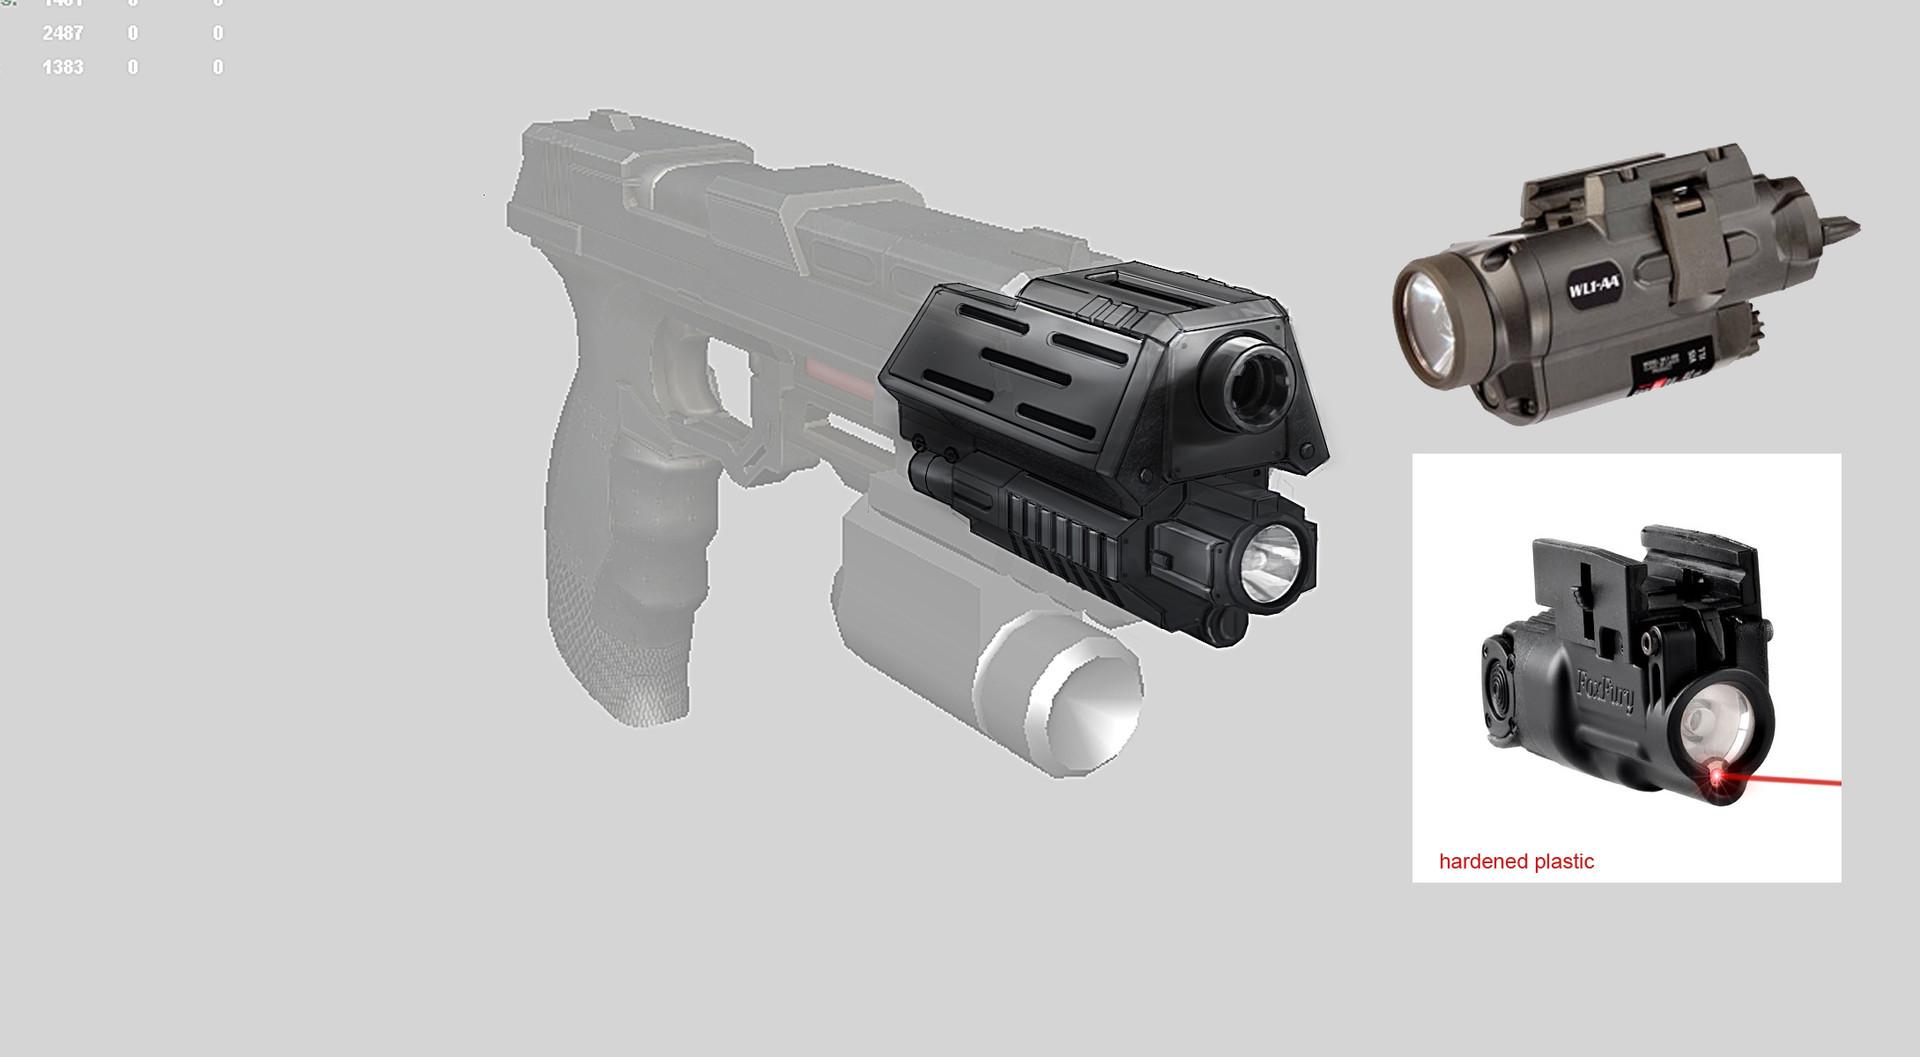 Brian yam nevec pistol upgradeb